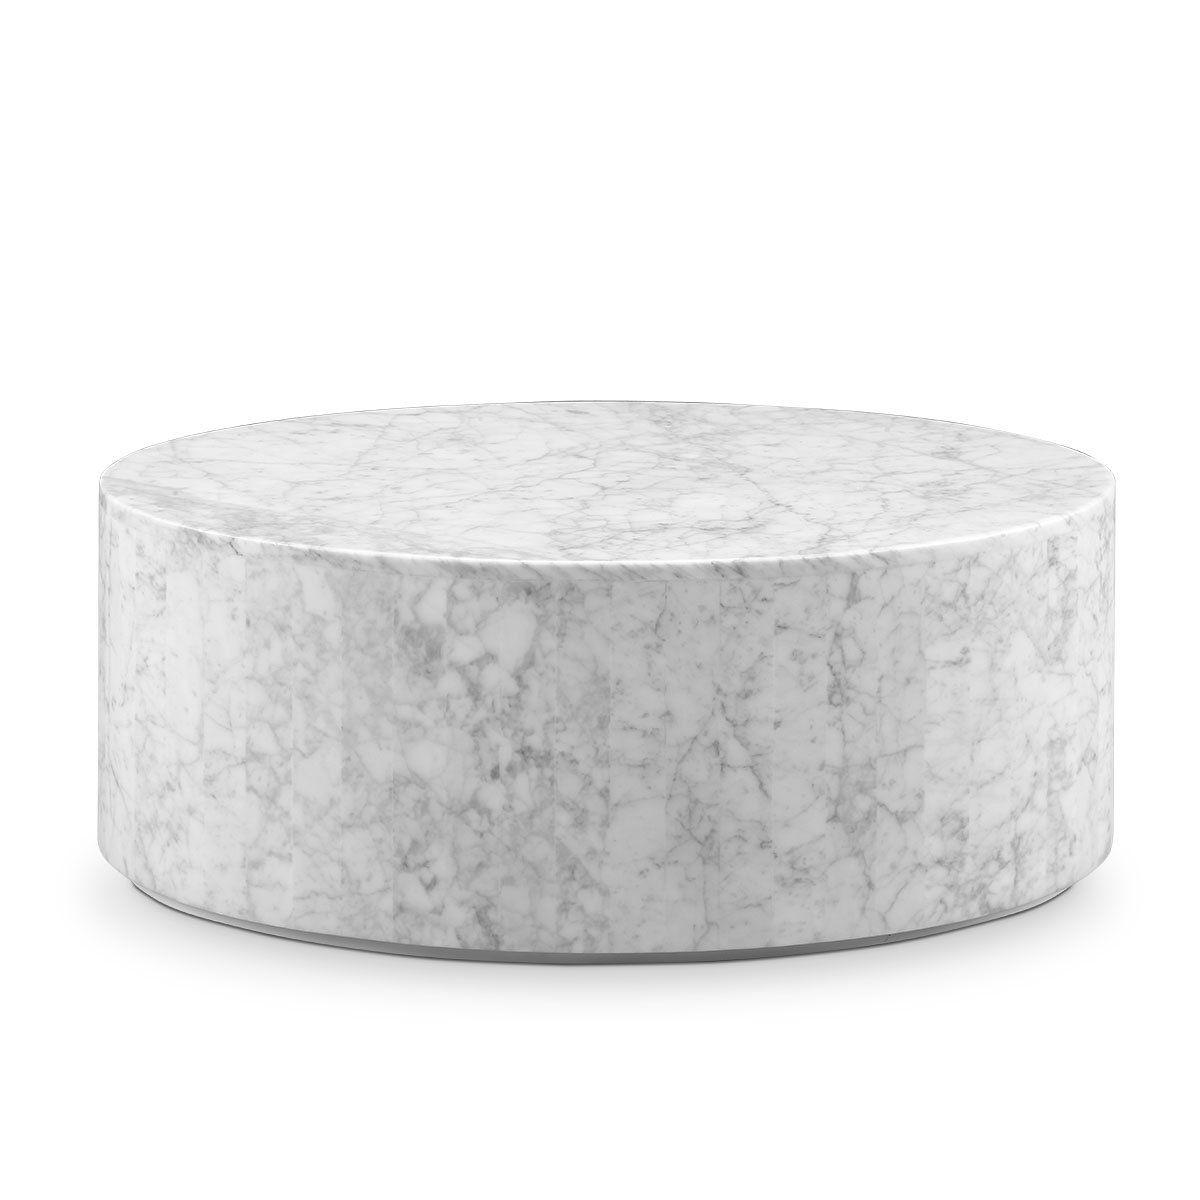 Carrara Marble Drum Coffee Table Oval Drum coffee